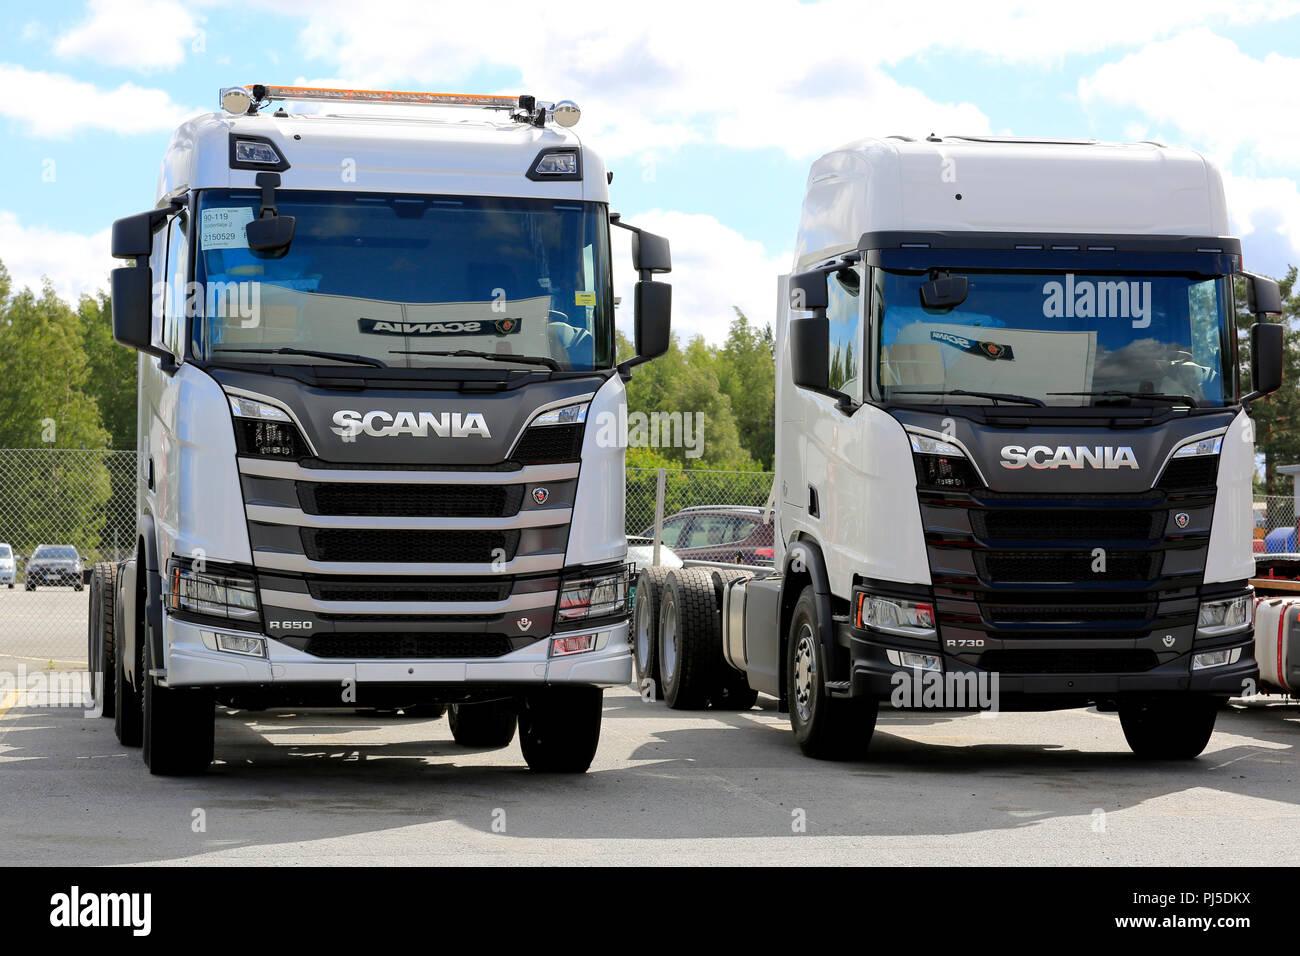 Scania Logo Stock Photos & Scania Logo Stock Images - Alamy